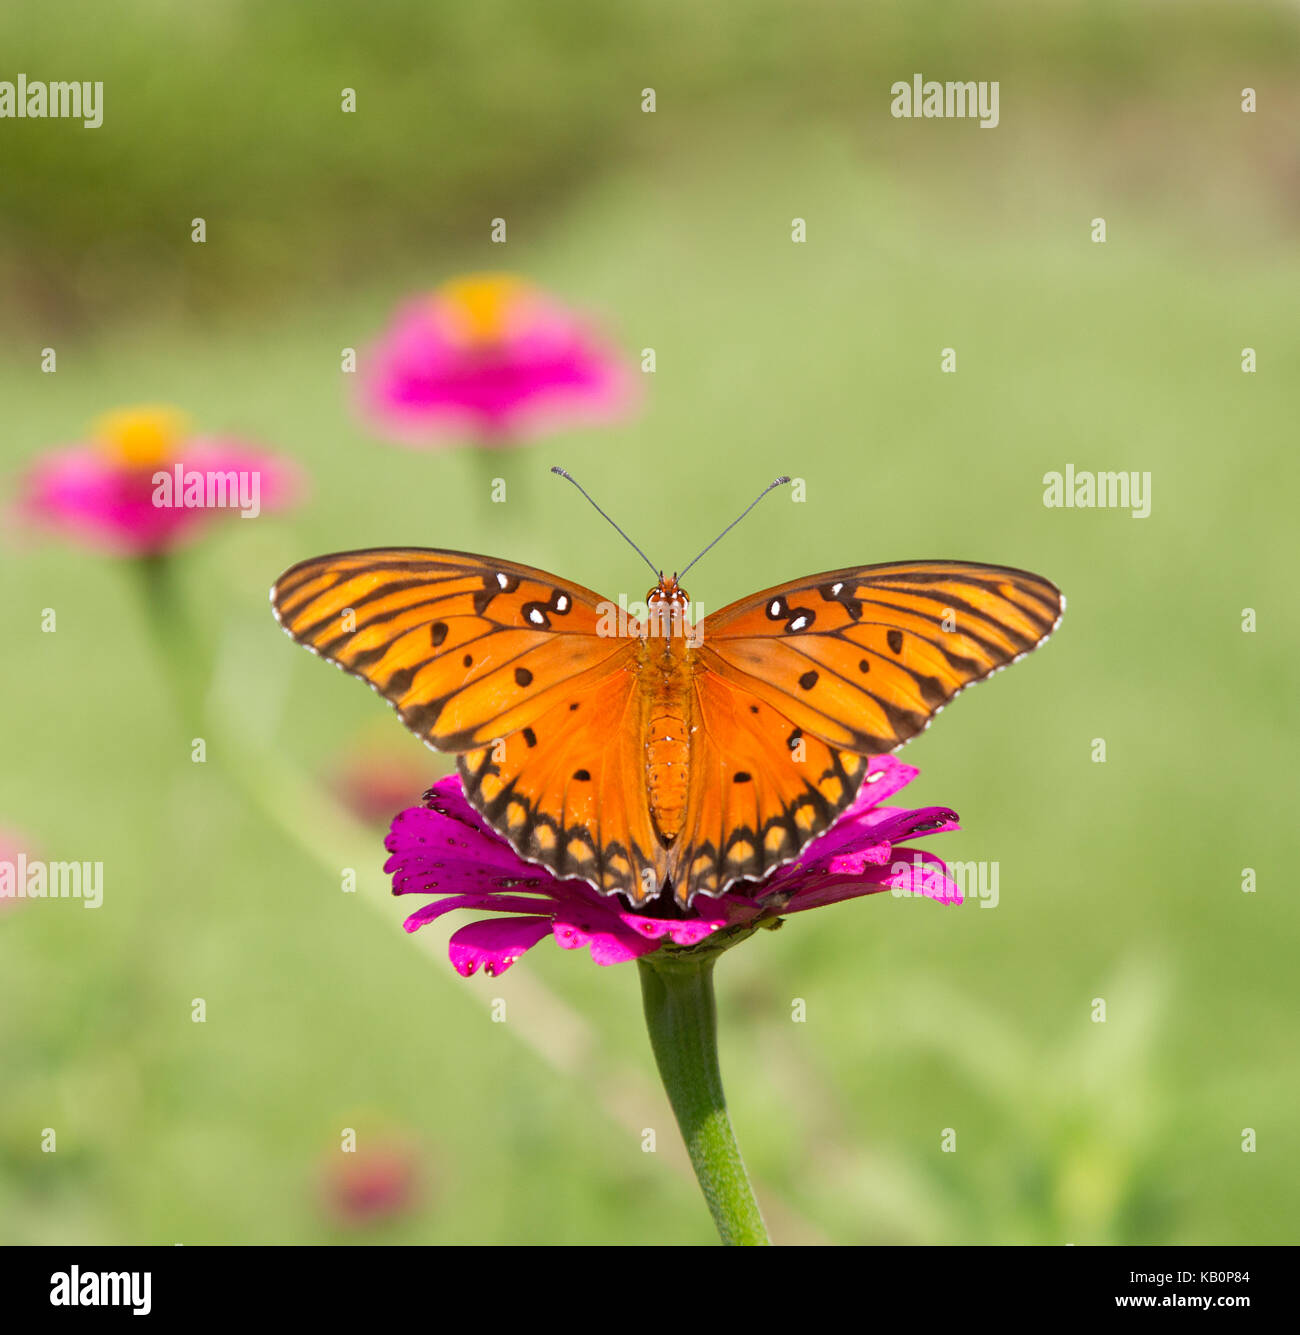 Gulf fritillary papillon sur fleur magenta Photo Stock